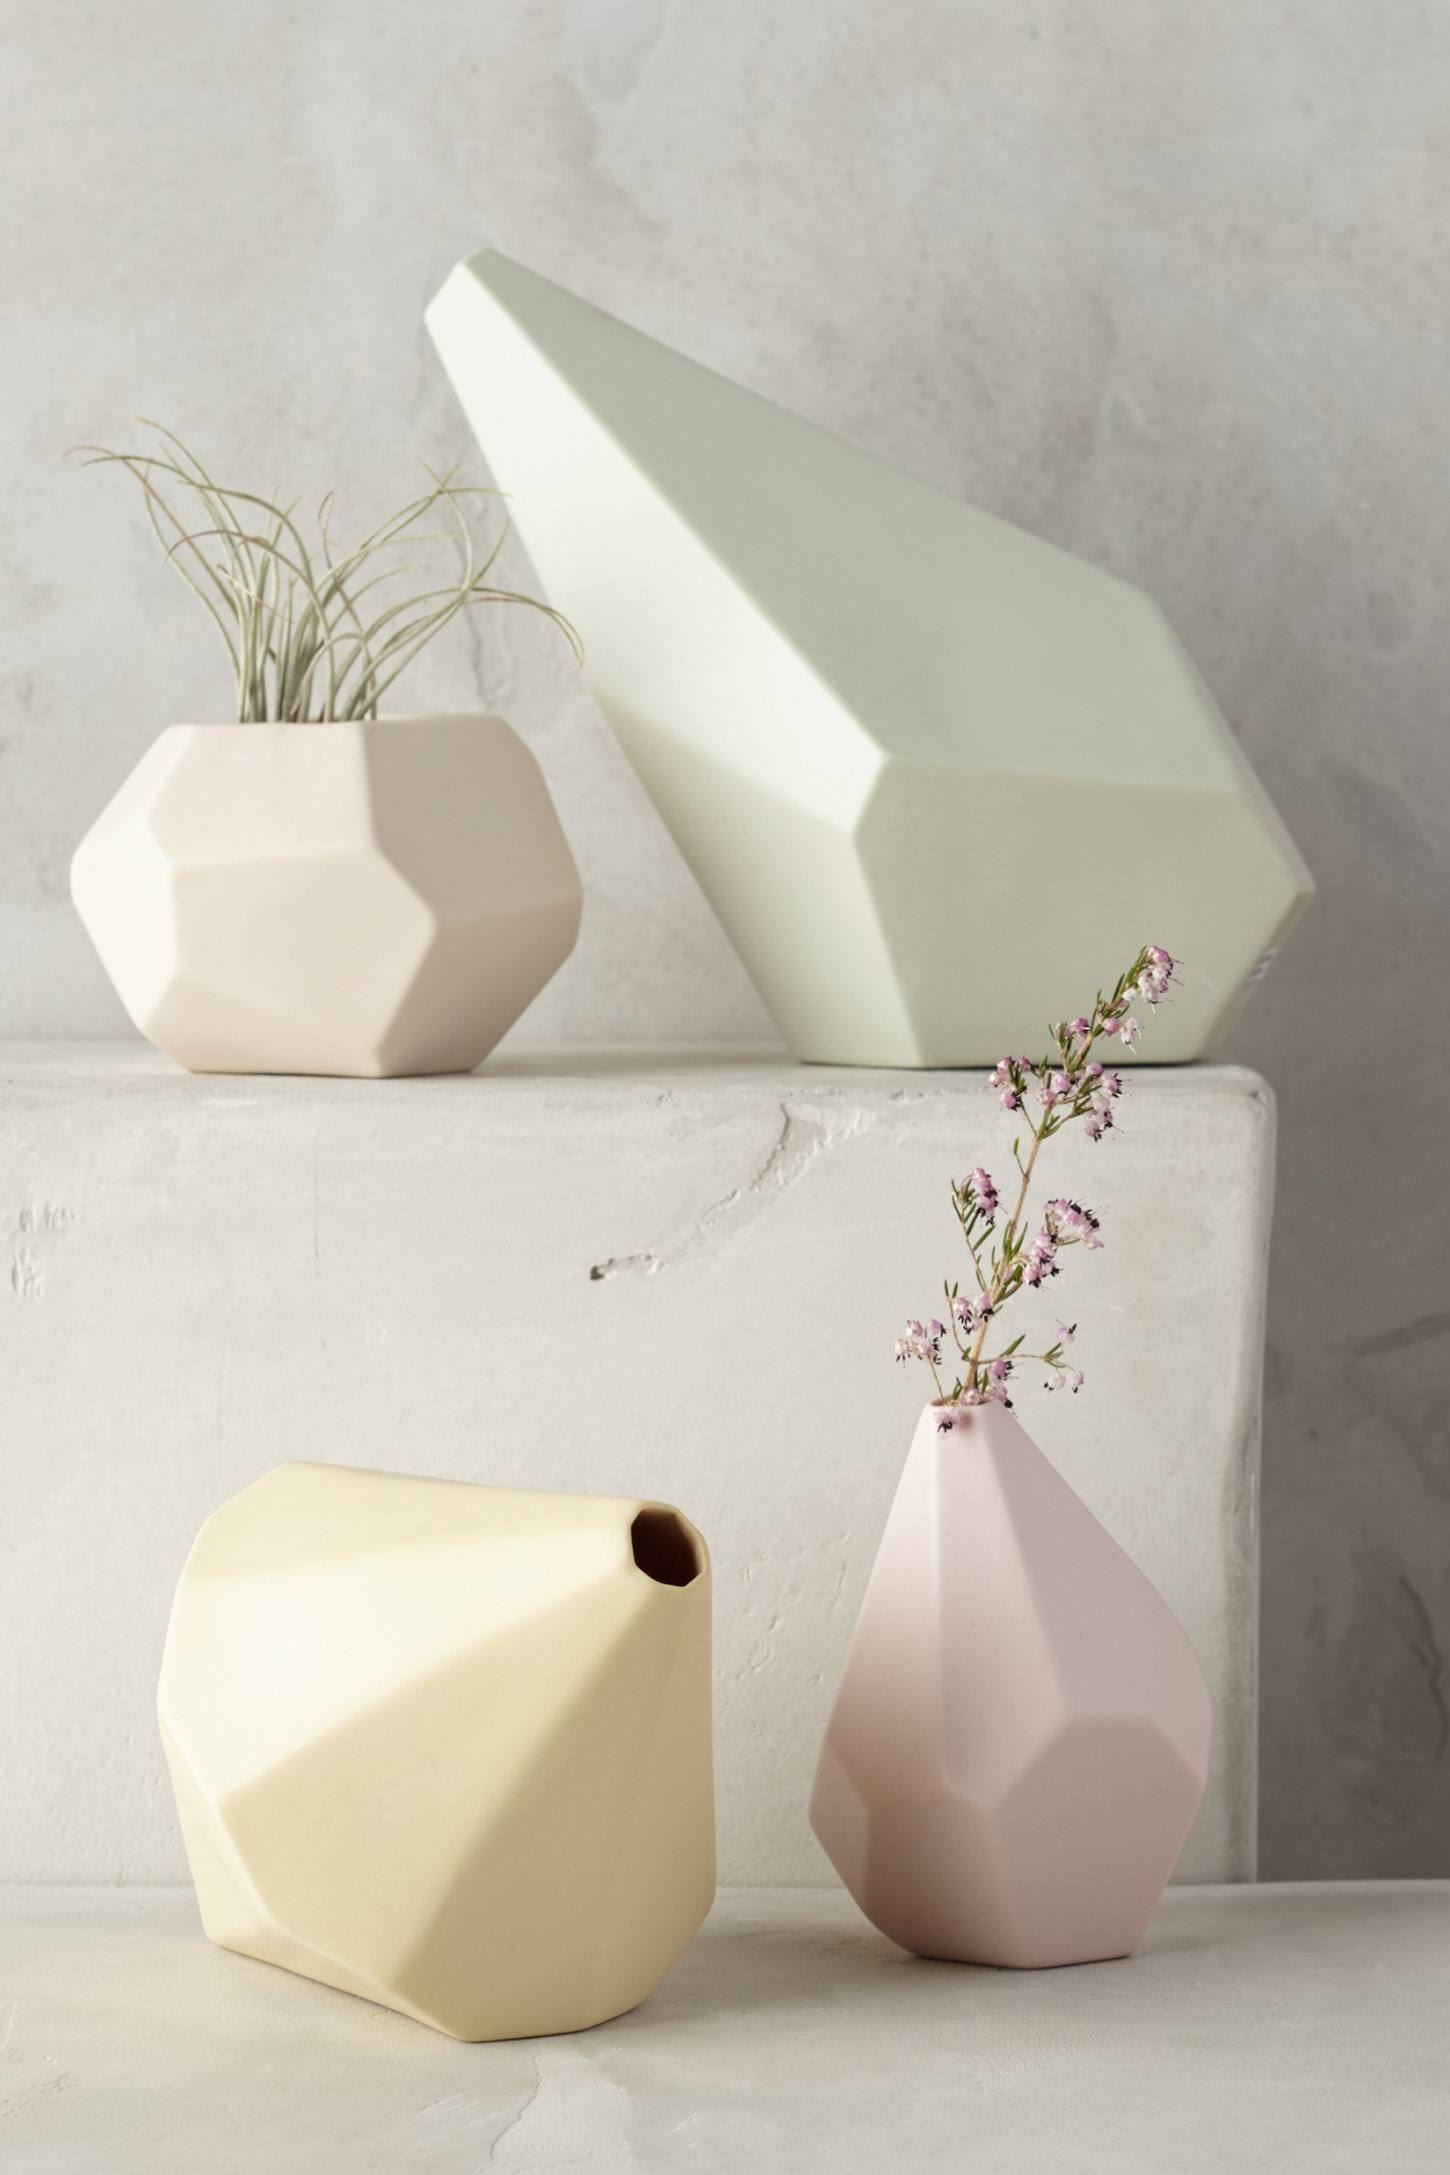 Geo vases from Anthropologie